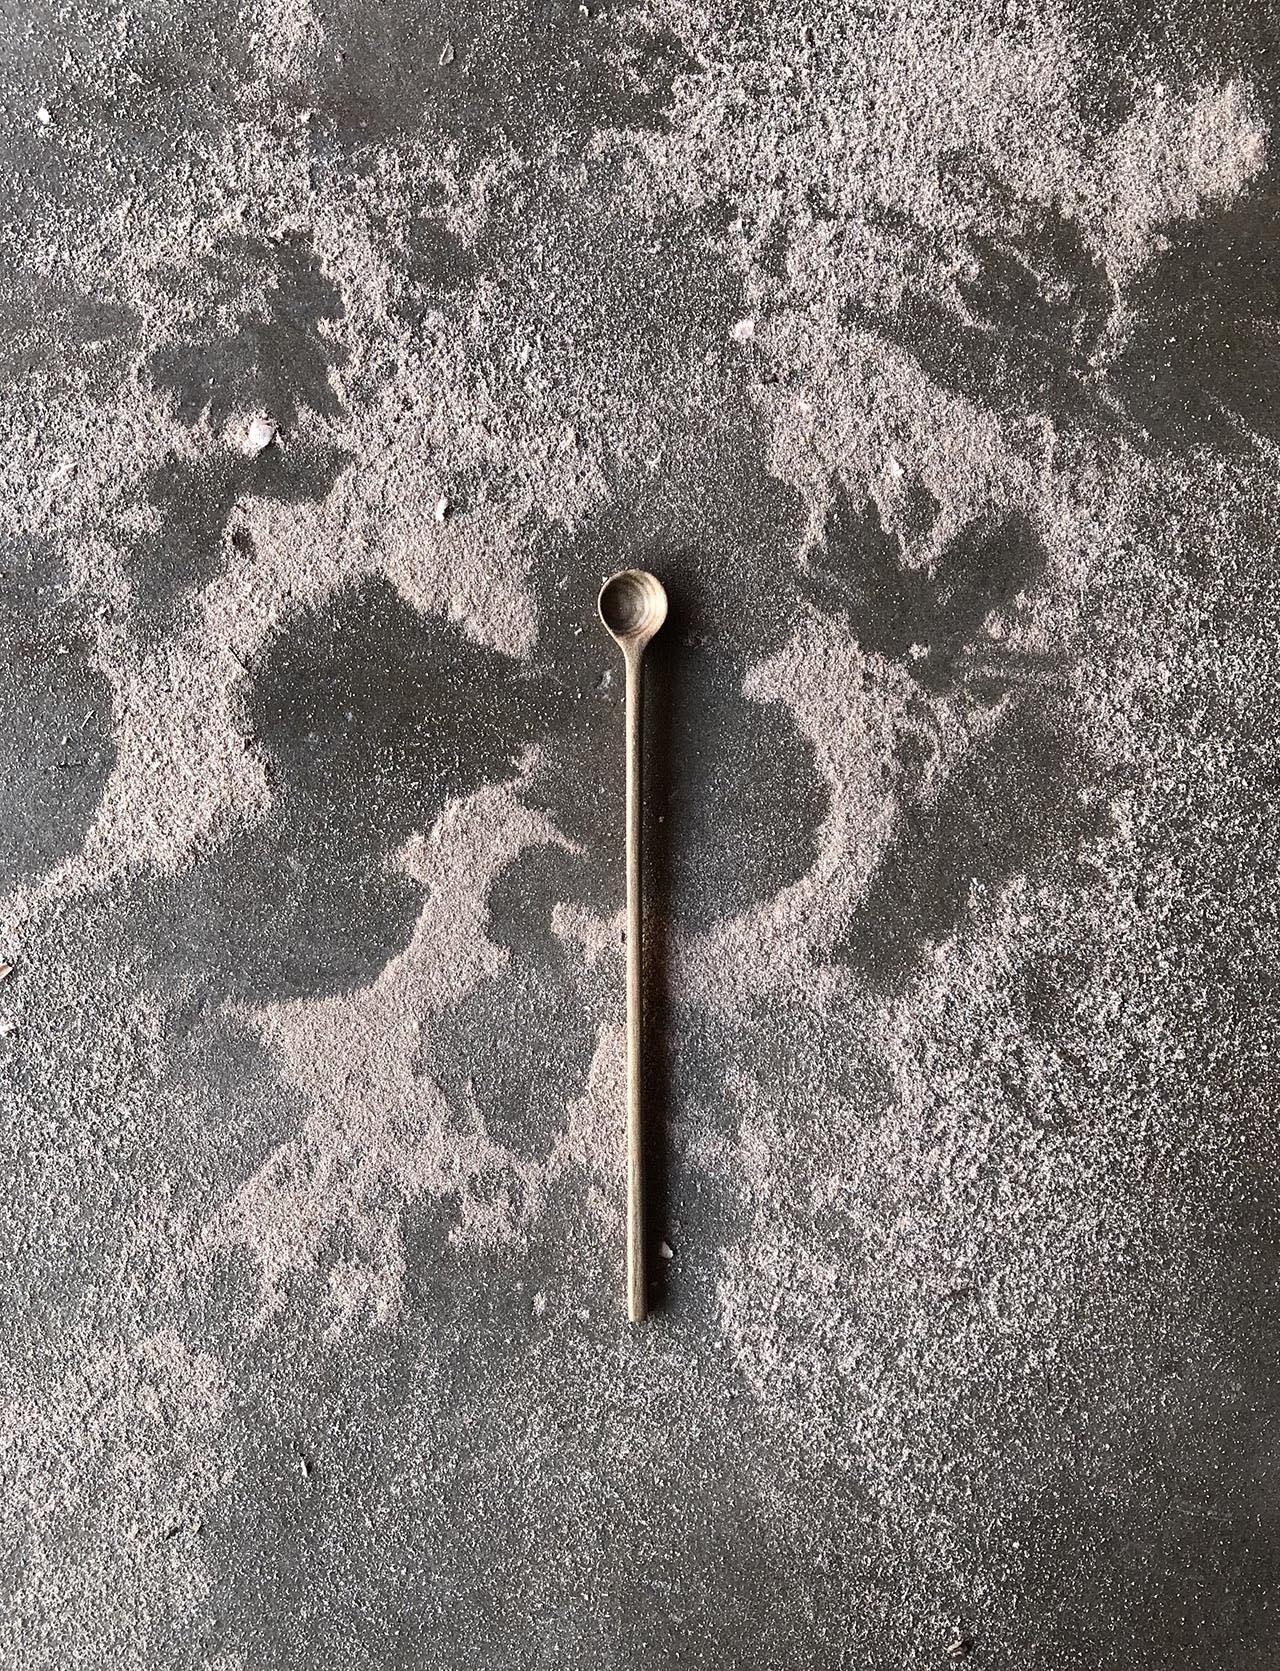 Maple Teeny Tiny Stirring Spoon from Unlikely Objects